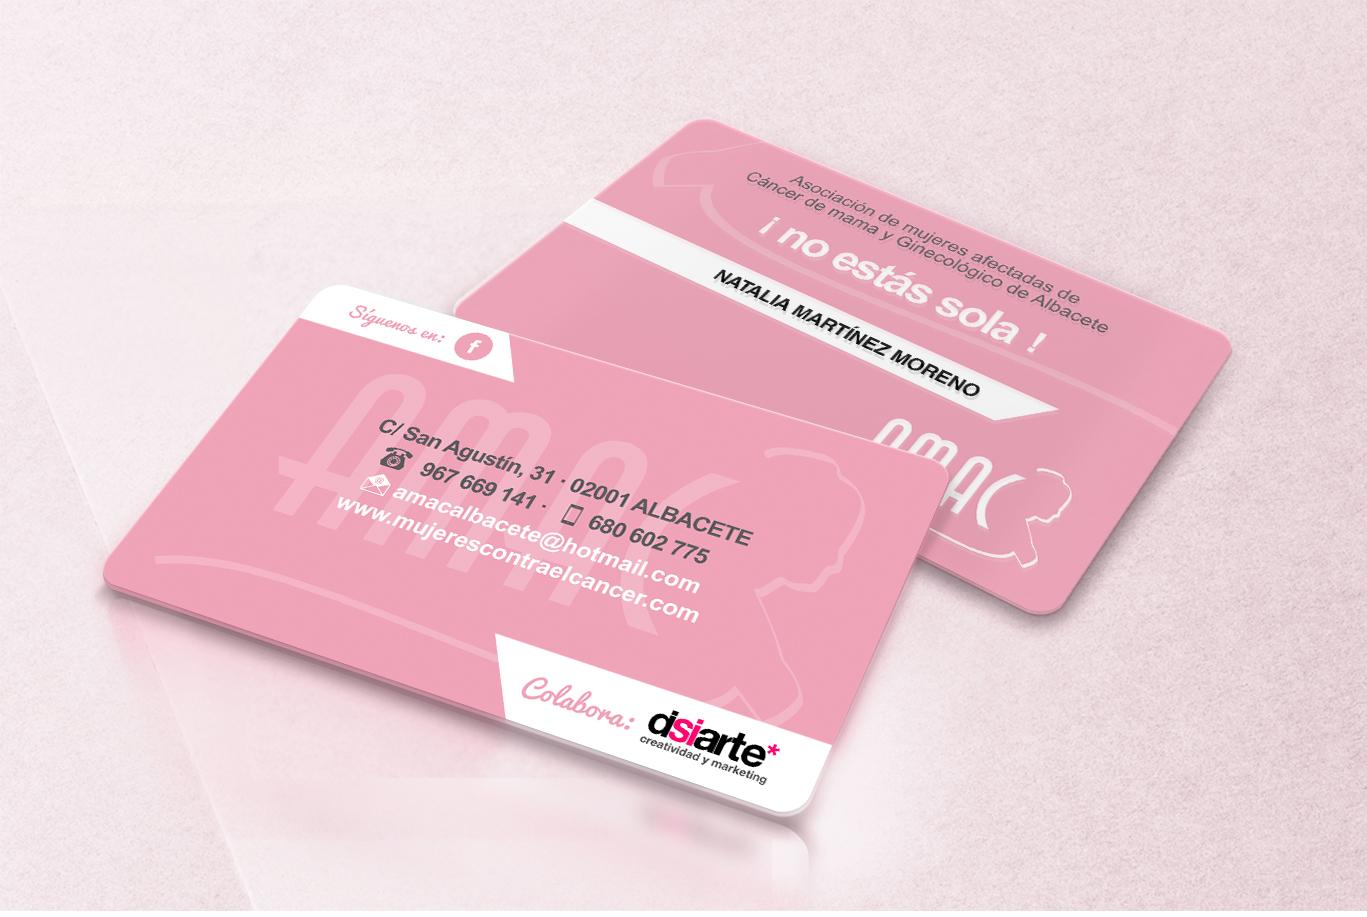 Diseño gráfico, diseño grafico Albacete e imprenta de tarjetas pvc AMAC